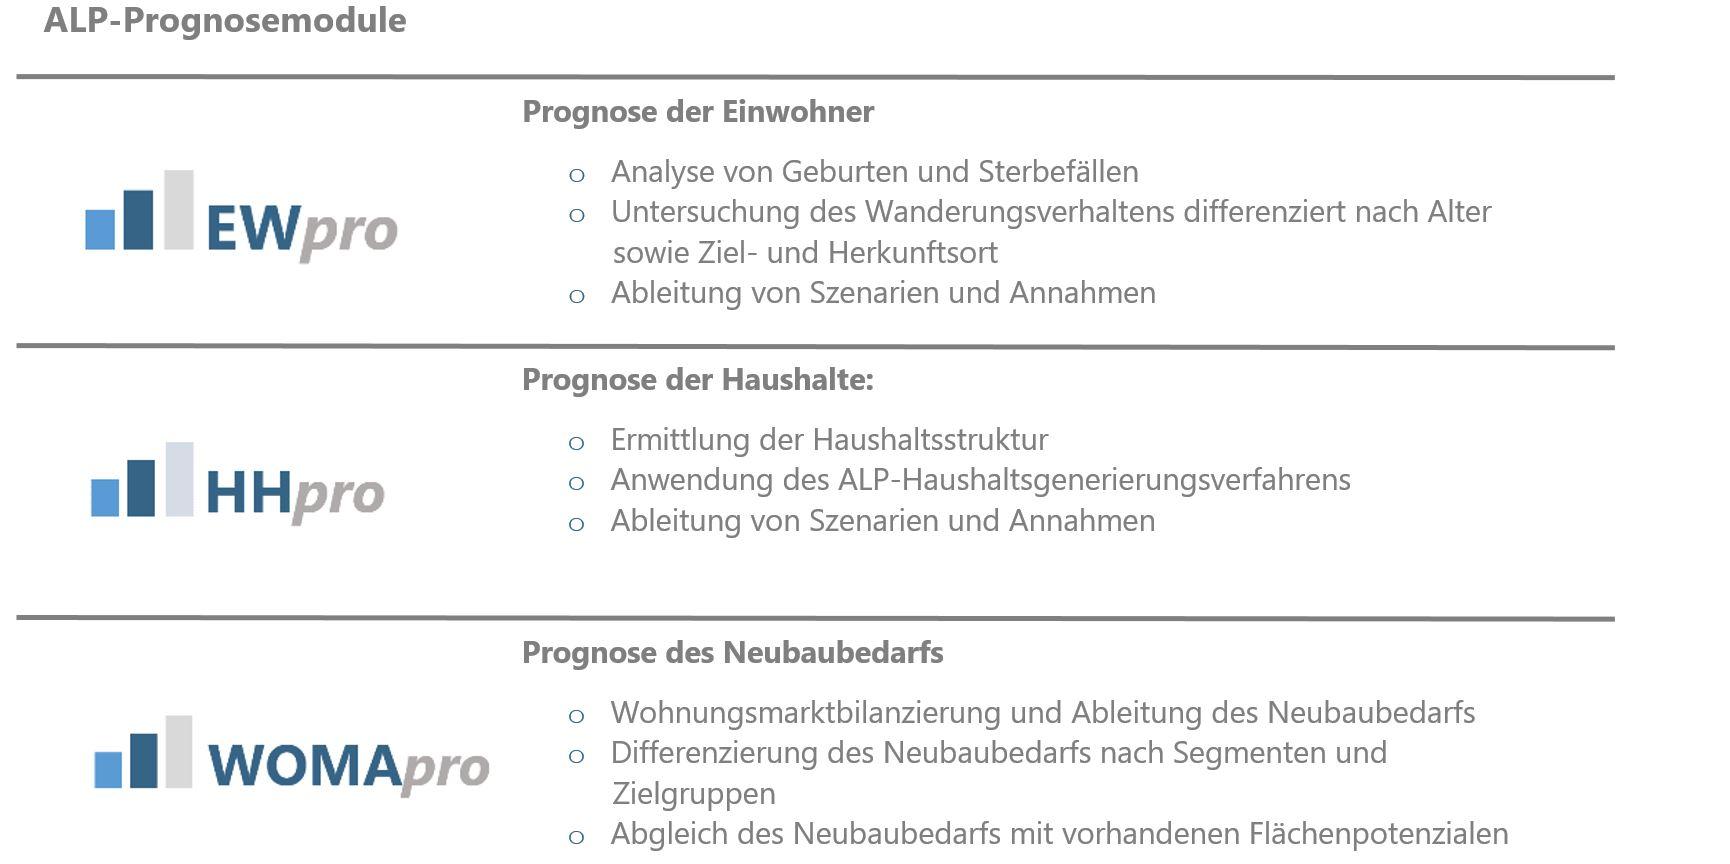 ALP - Prognosemodule3